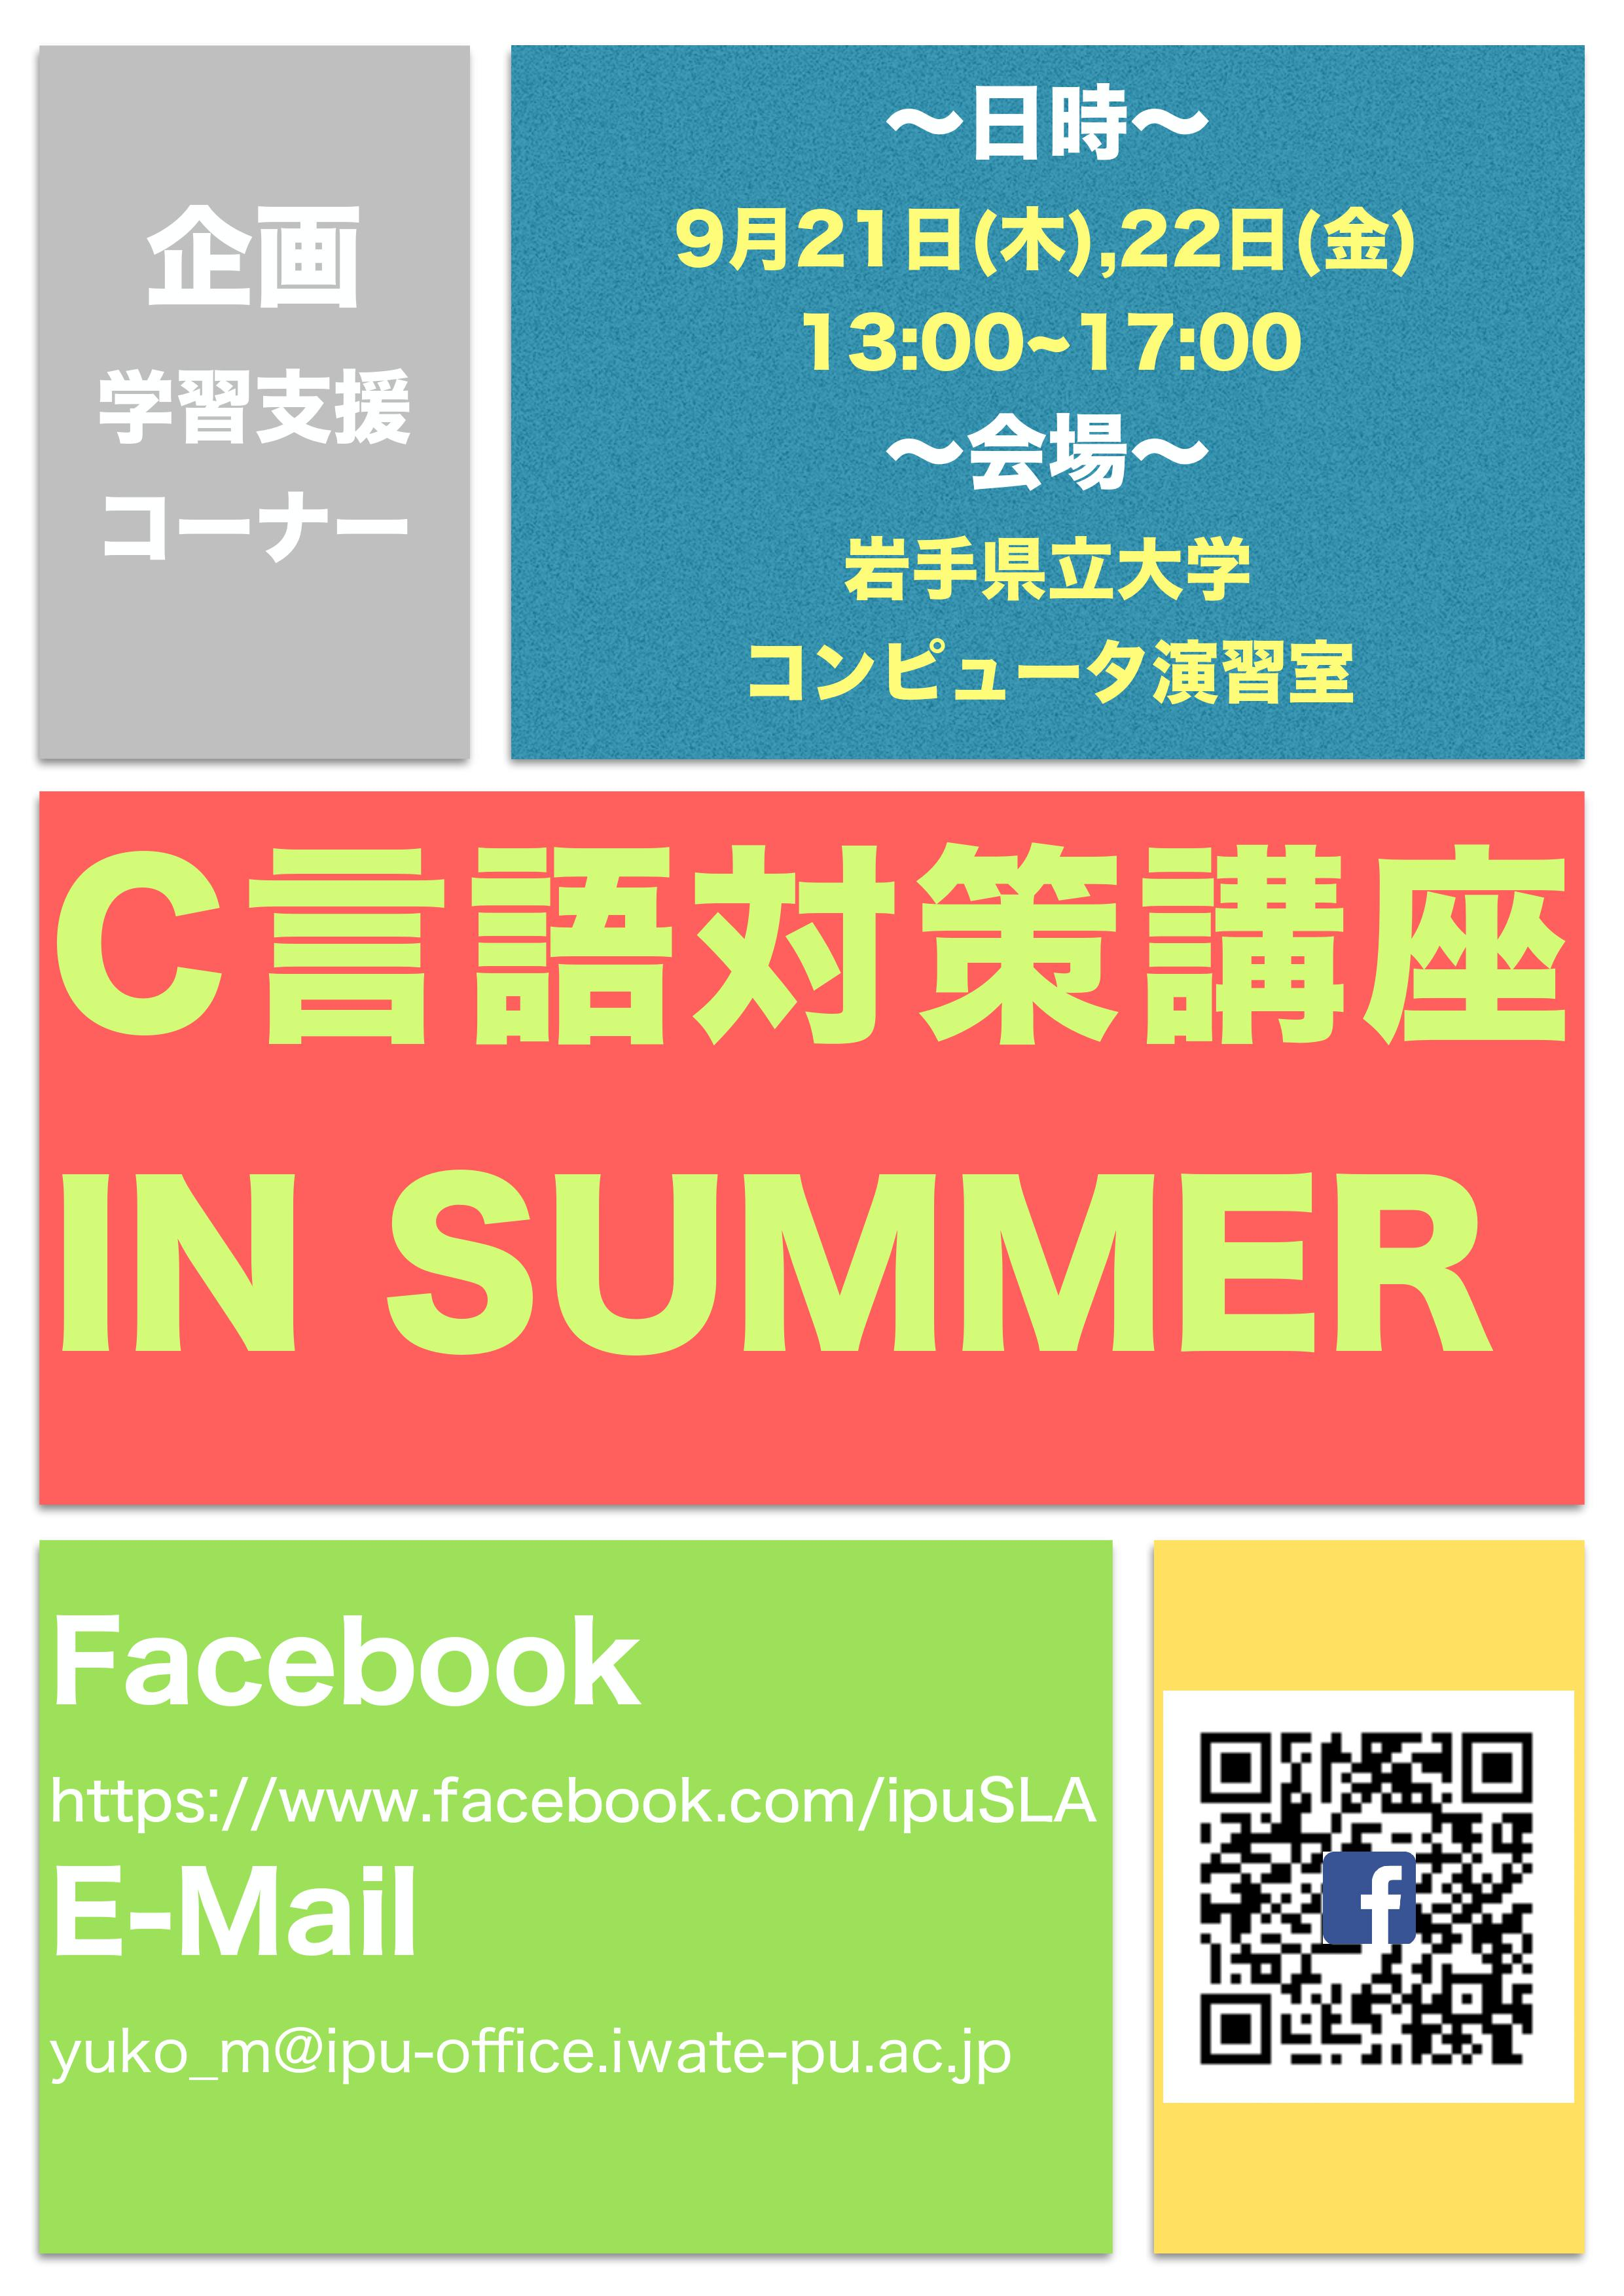 C言語講座 IN SUMMER 開催